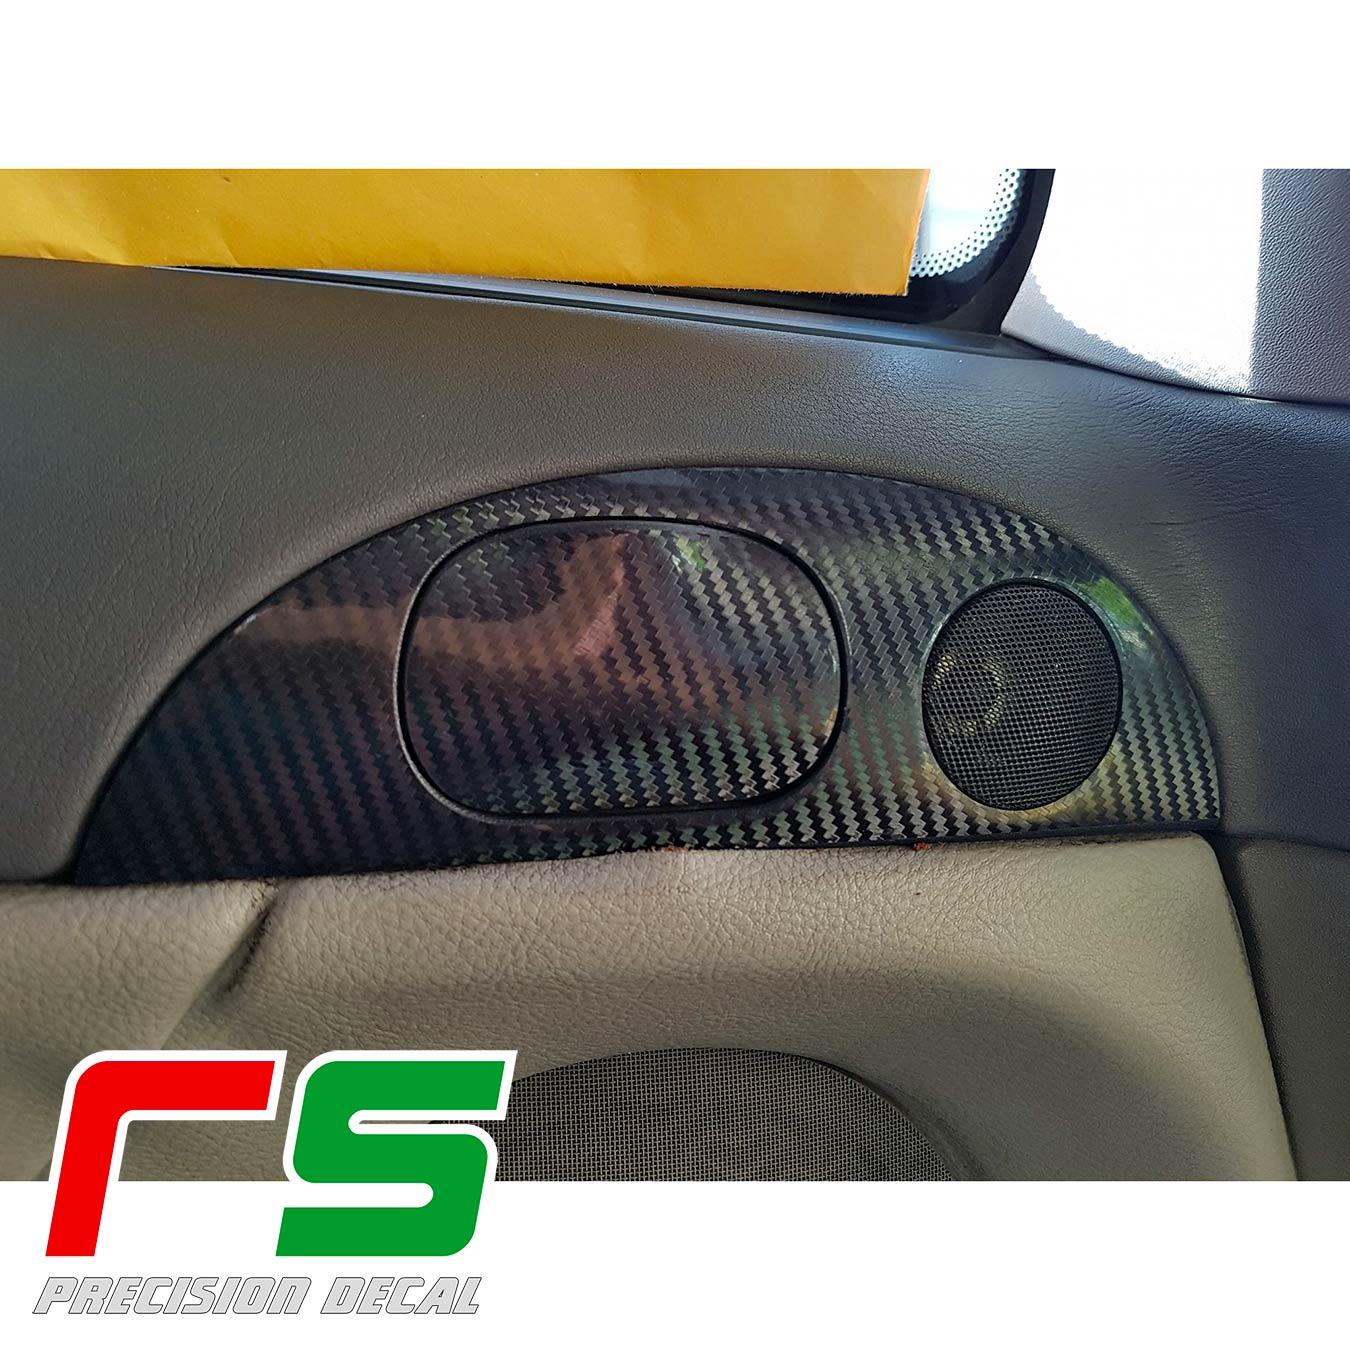 adhésifs Alfa Romeo 147 GT look carbone modénature tweeter sticker